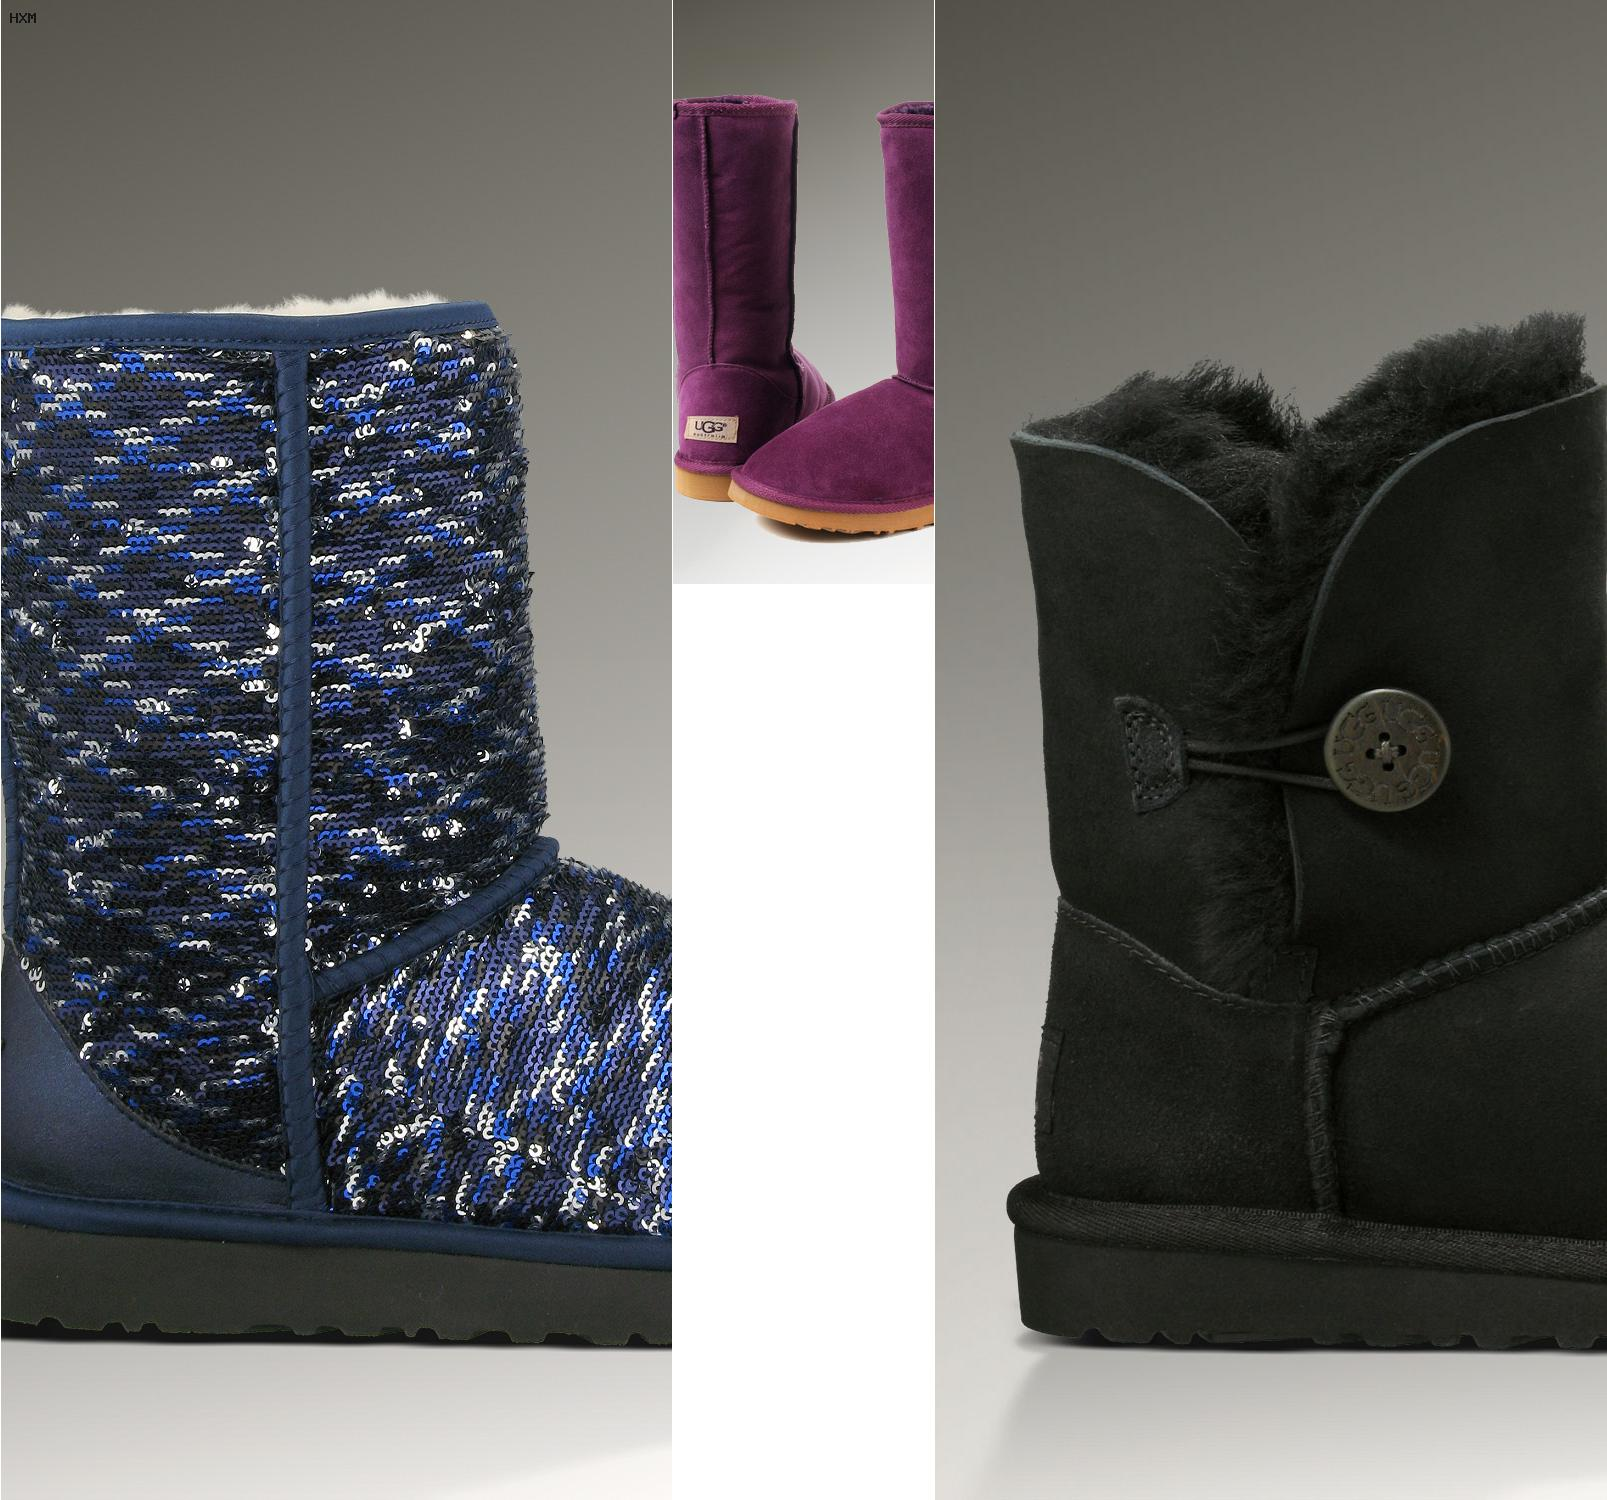 e80c39fbcd ugg boots schwarz kurz mit schleife